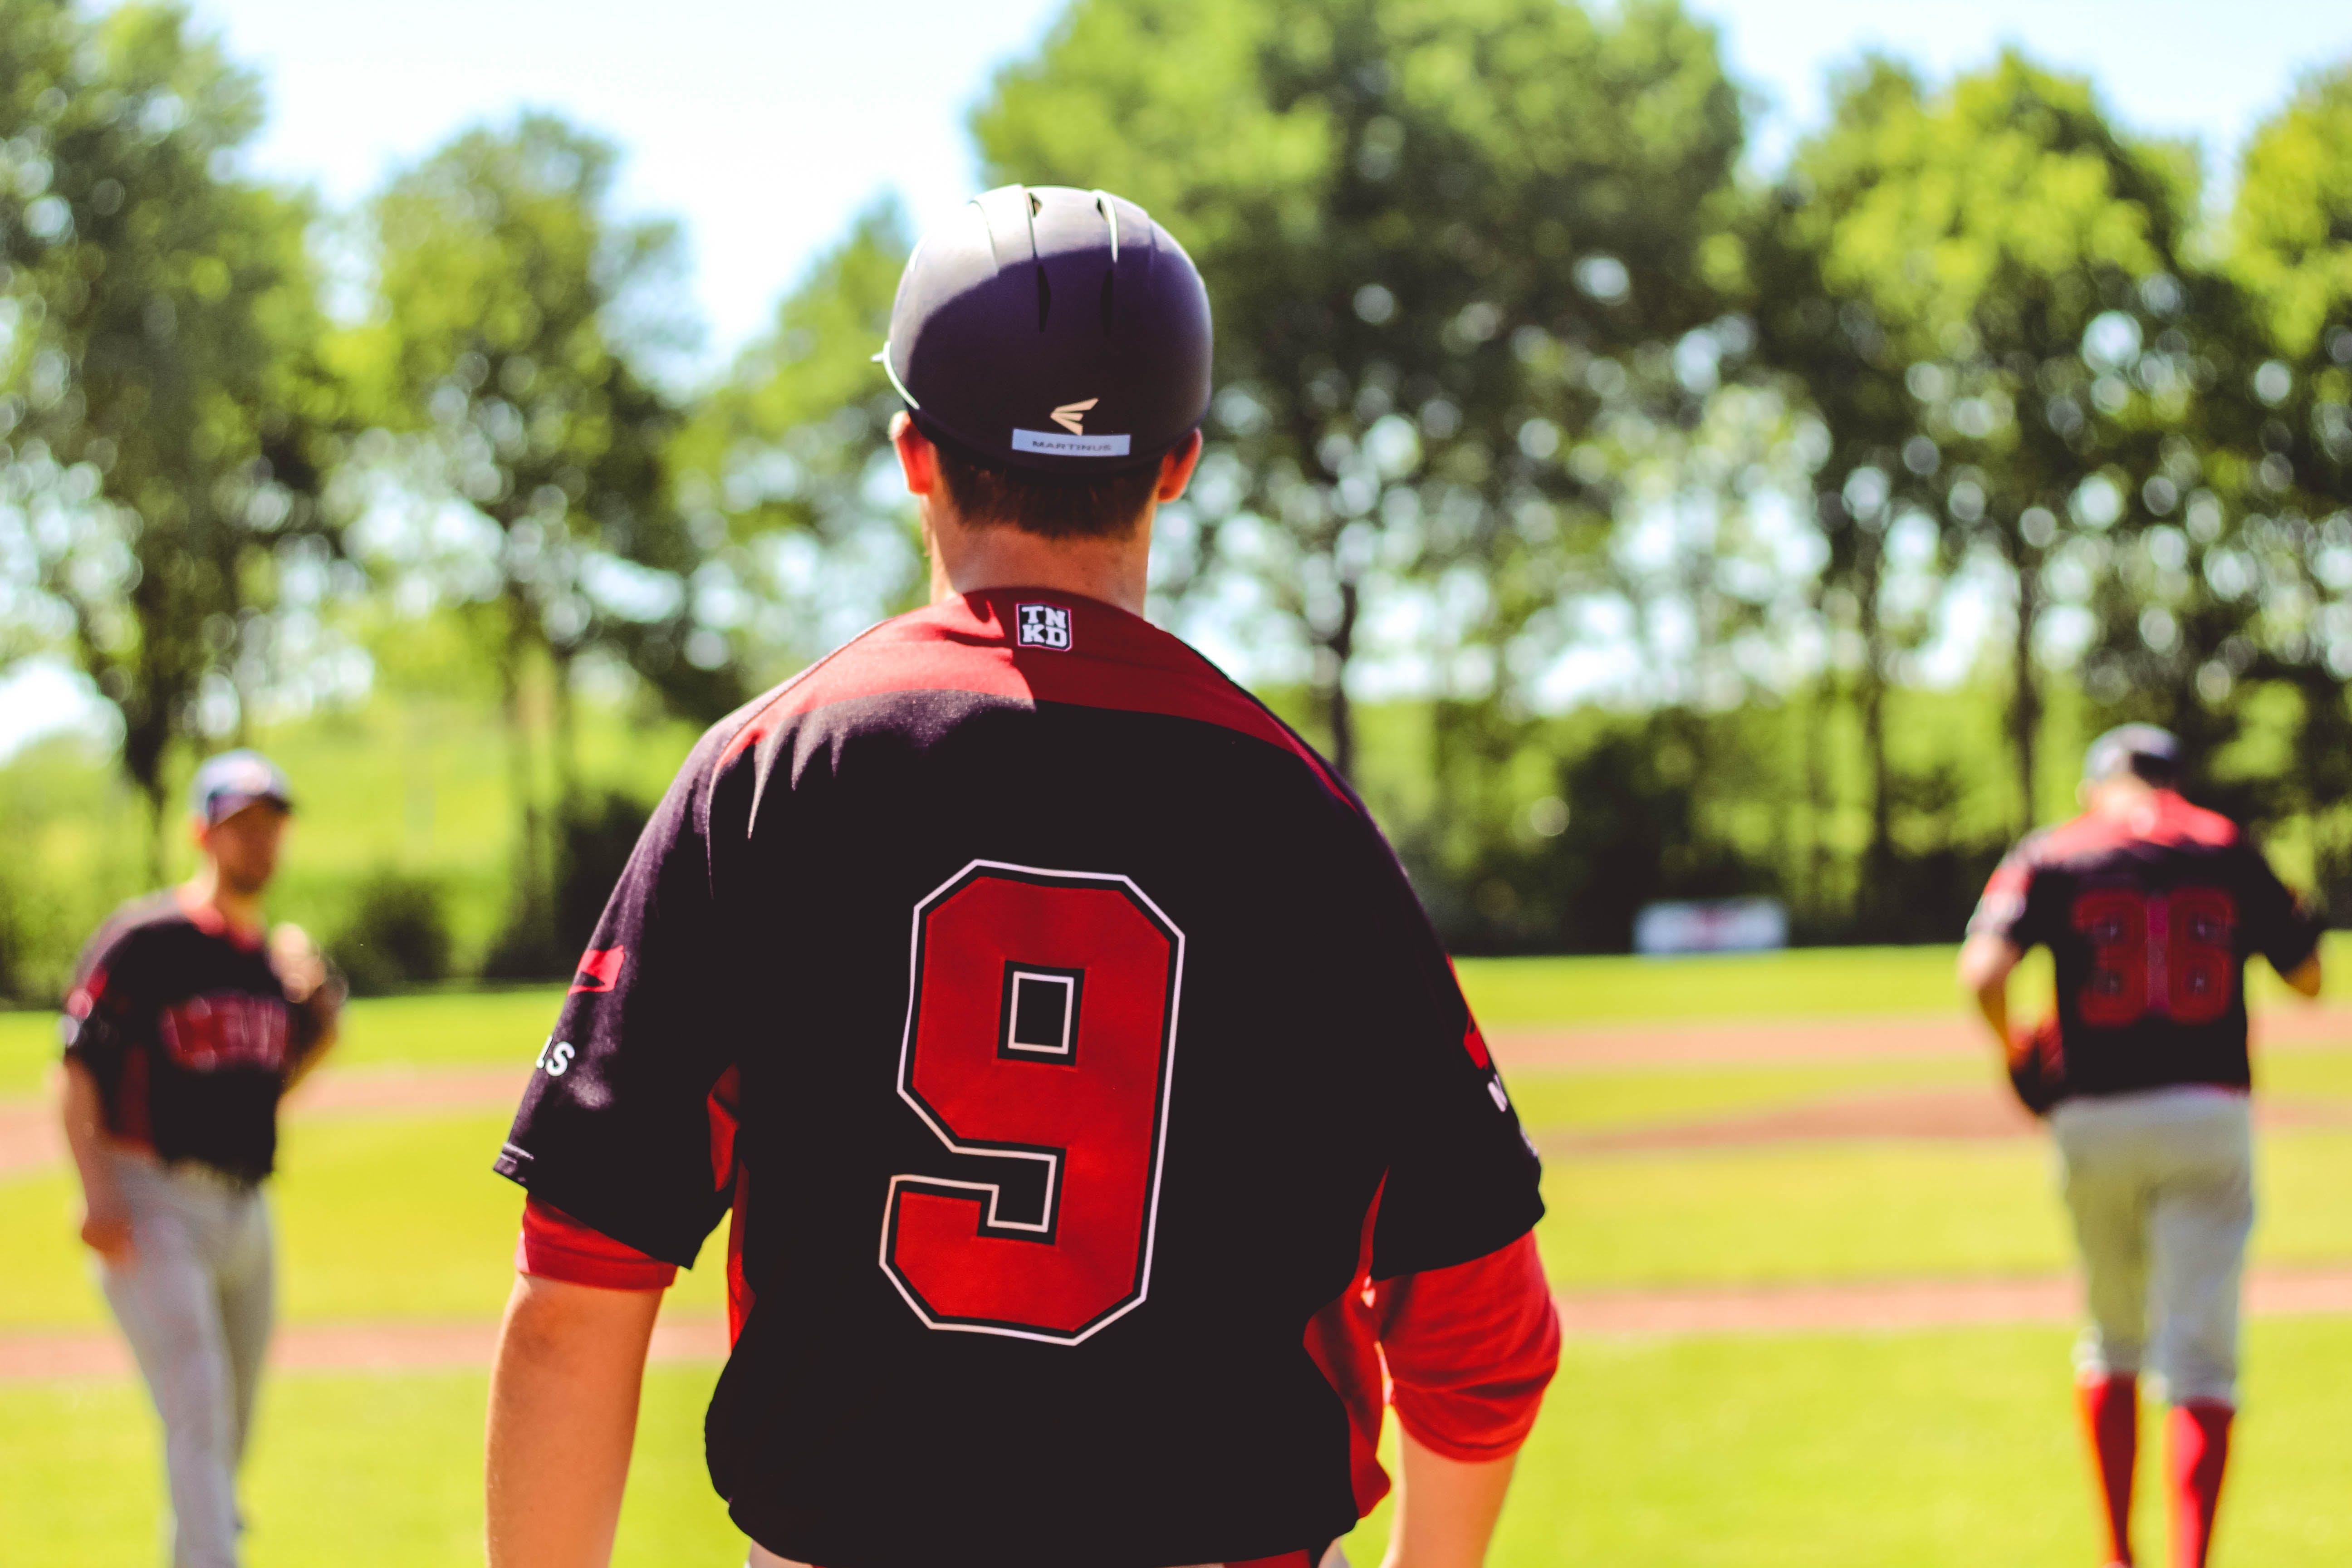 Kostenloses Stock Foto zu action, athleten, baseball-spieler, erholung